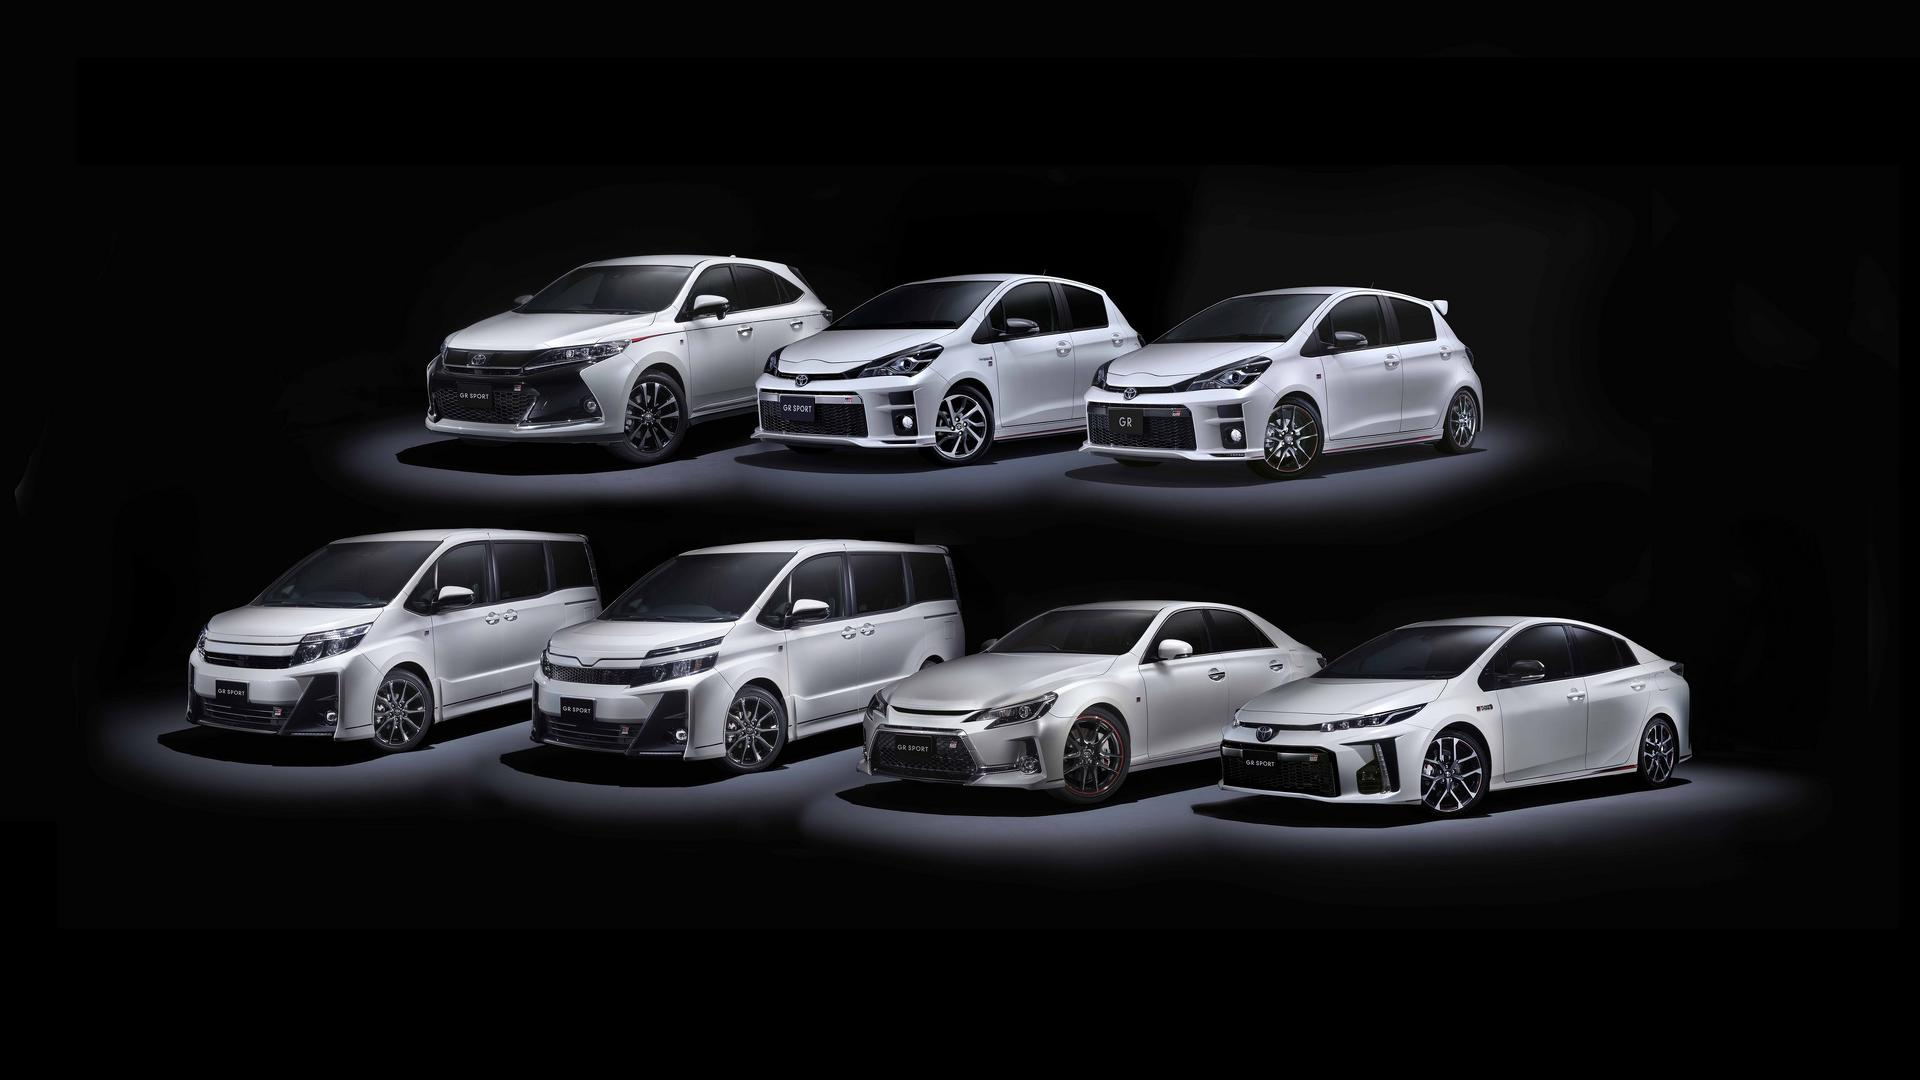 faze rug car. toyota launches its new gr sports c.. faze rug car